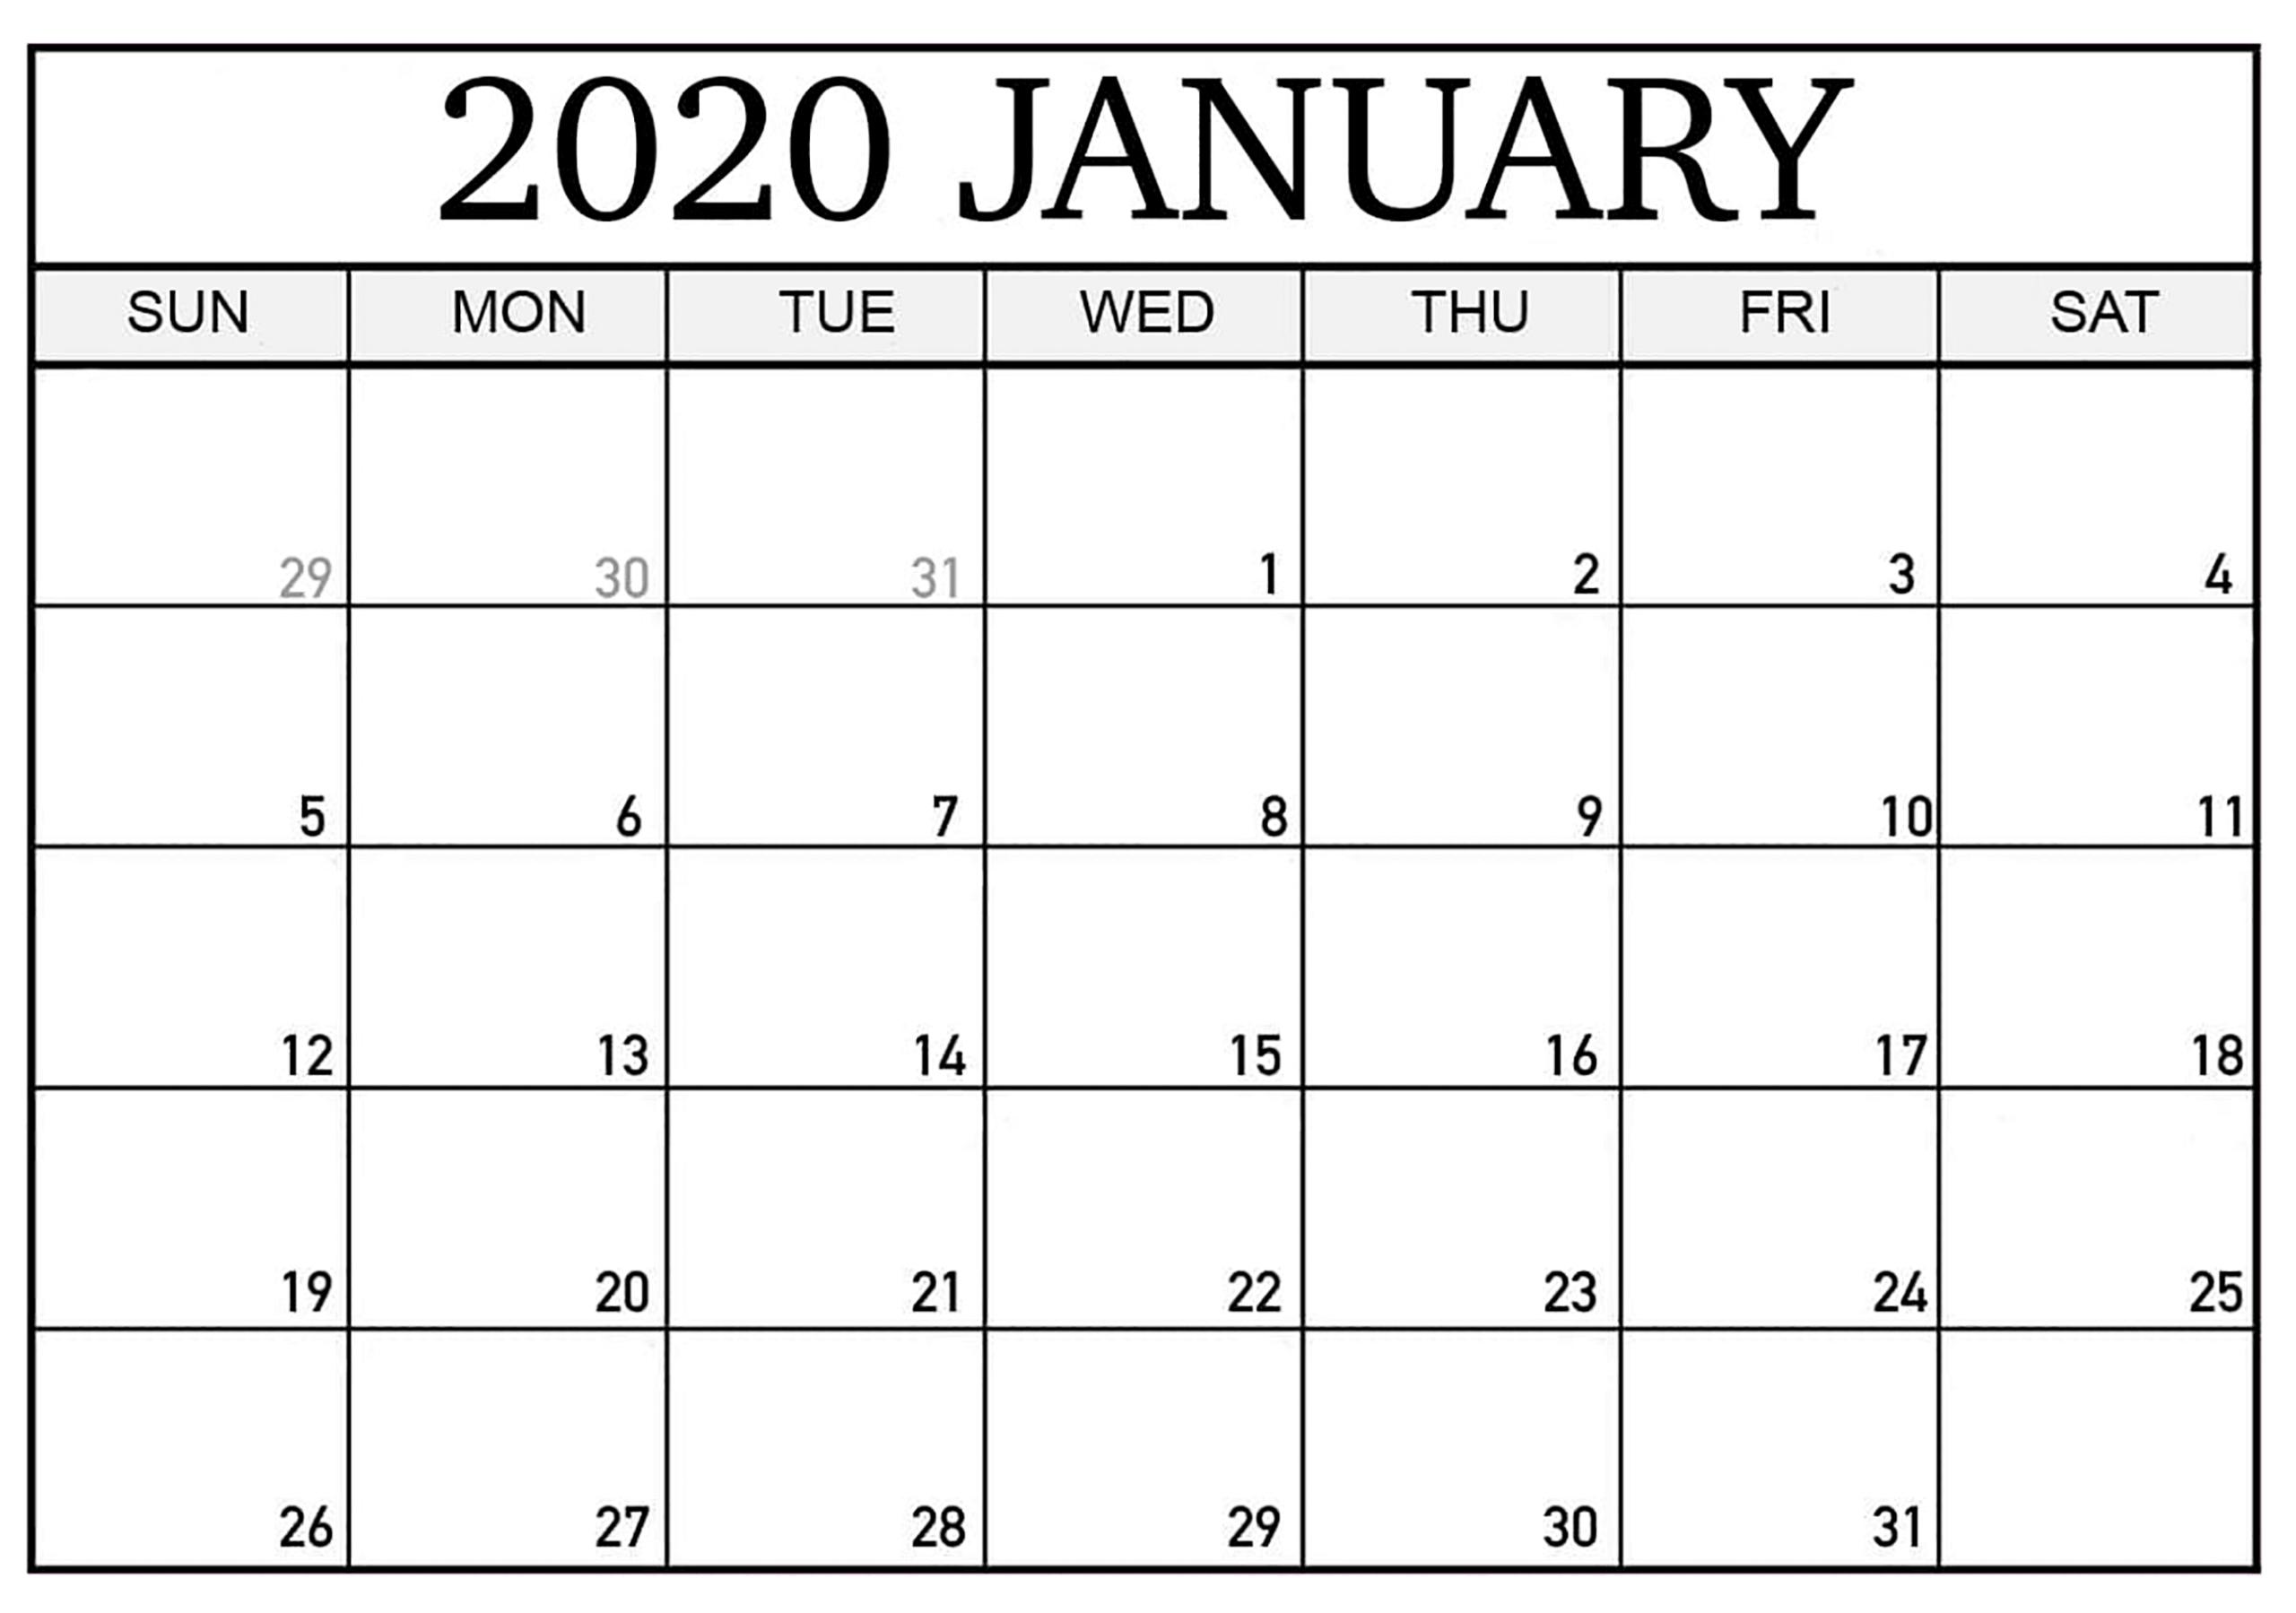 January 2020 Calendar Canada National Holidays - 2019